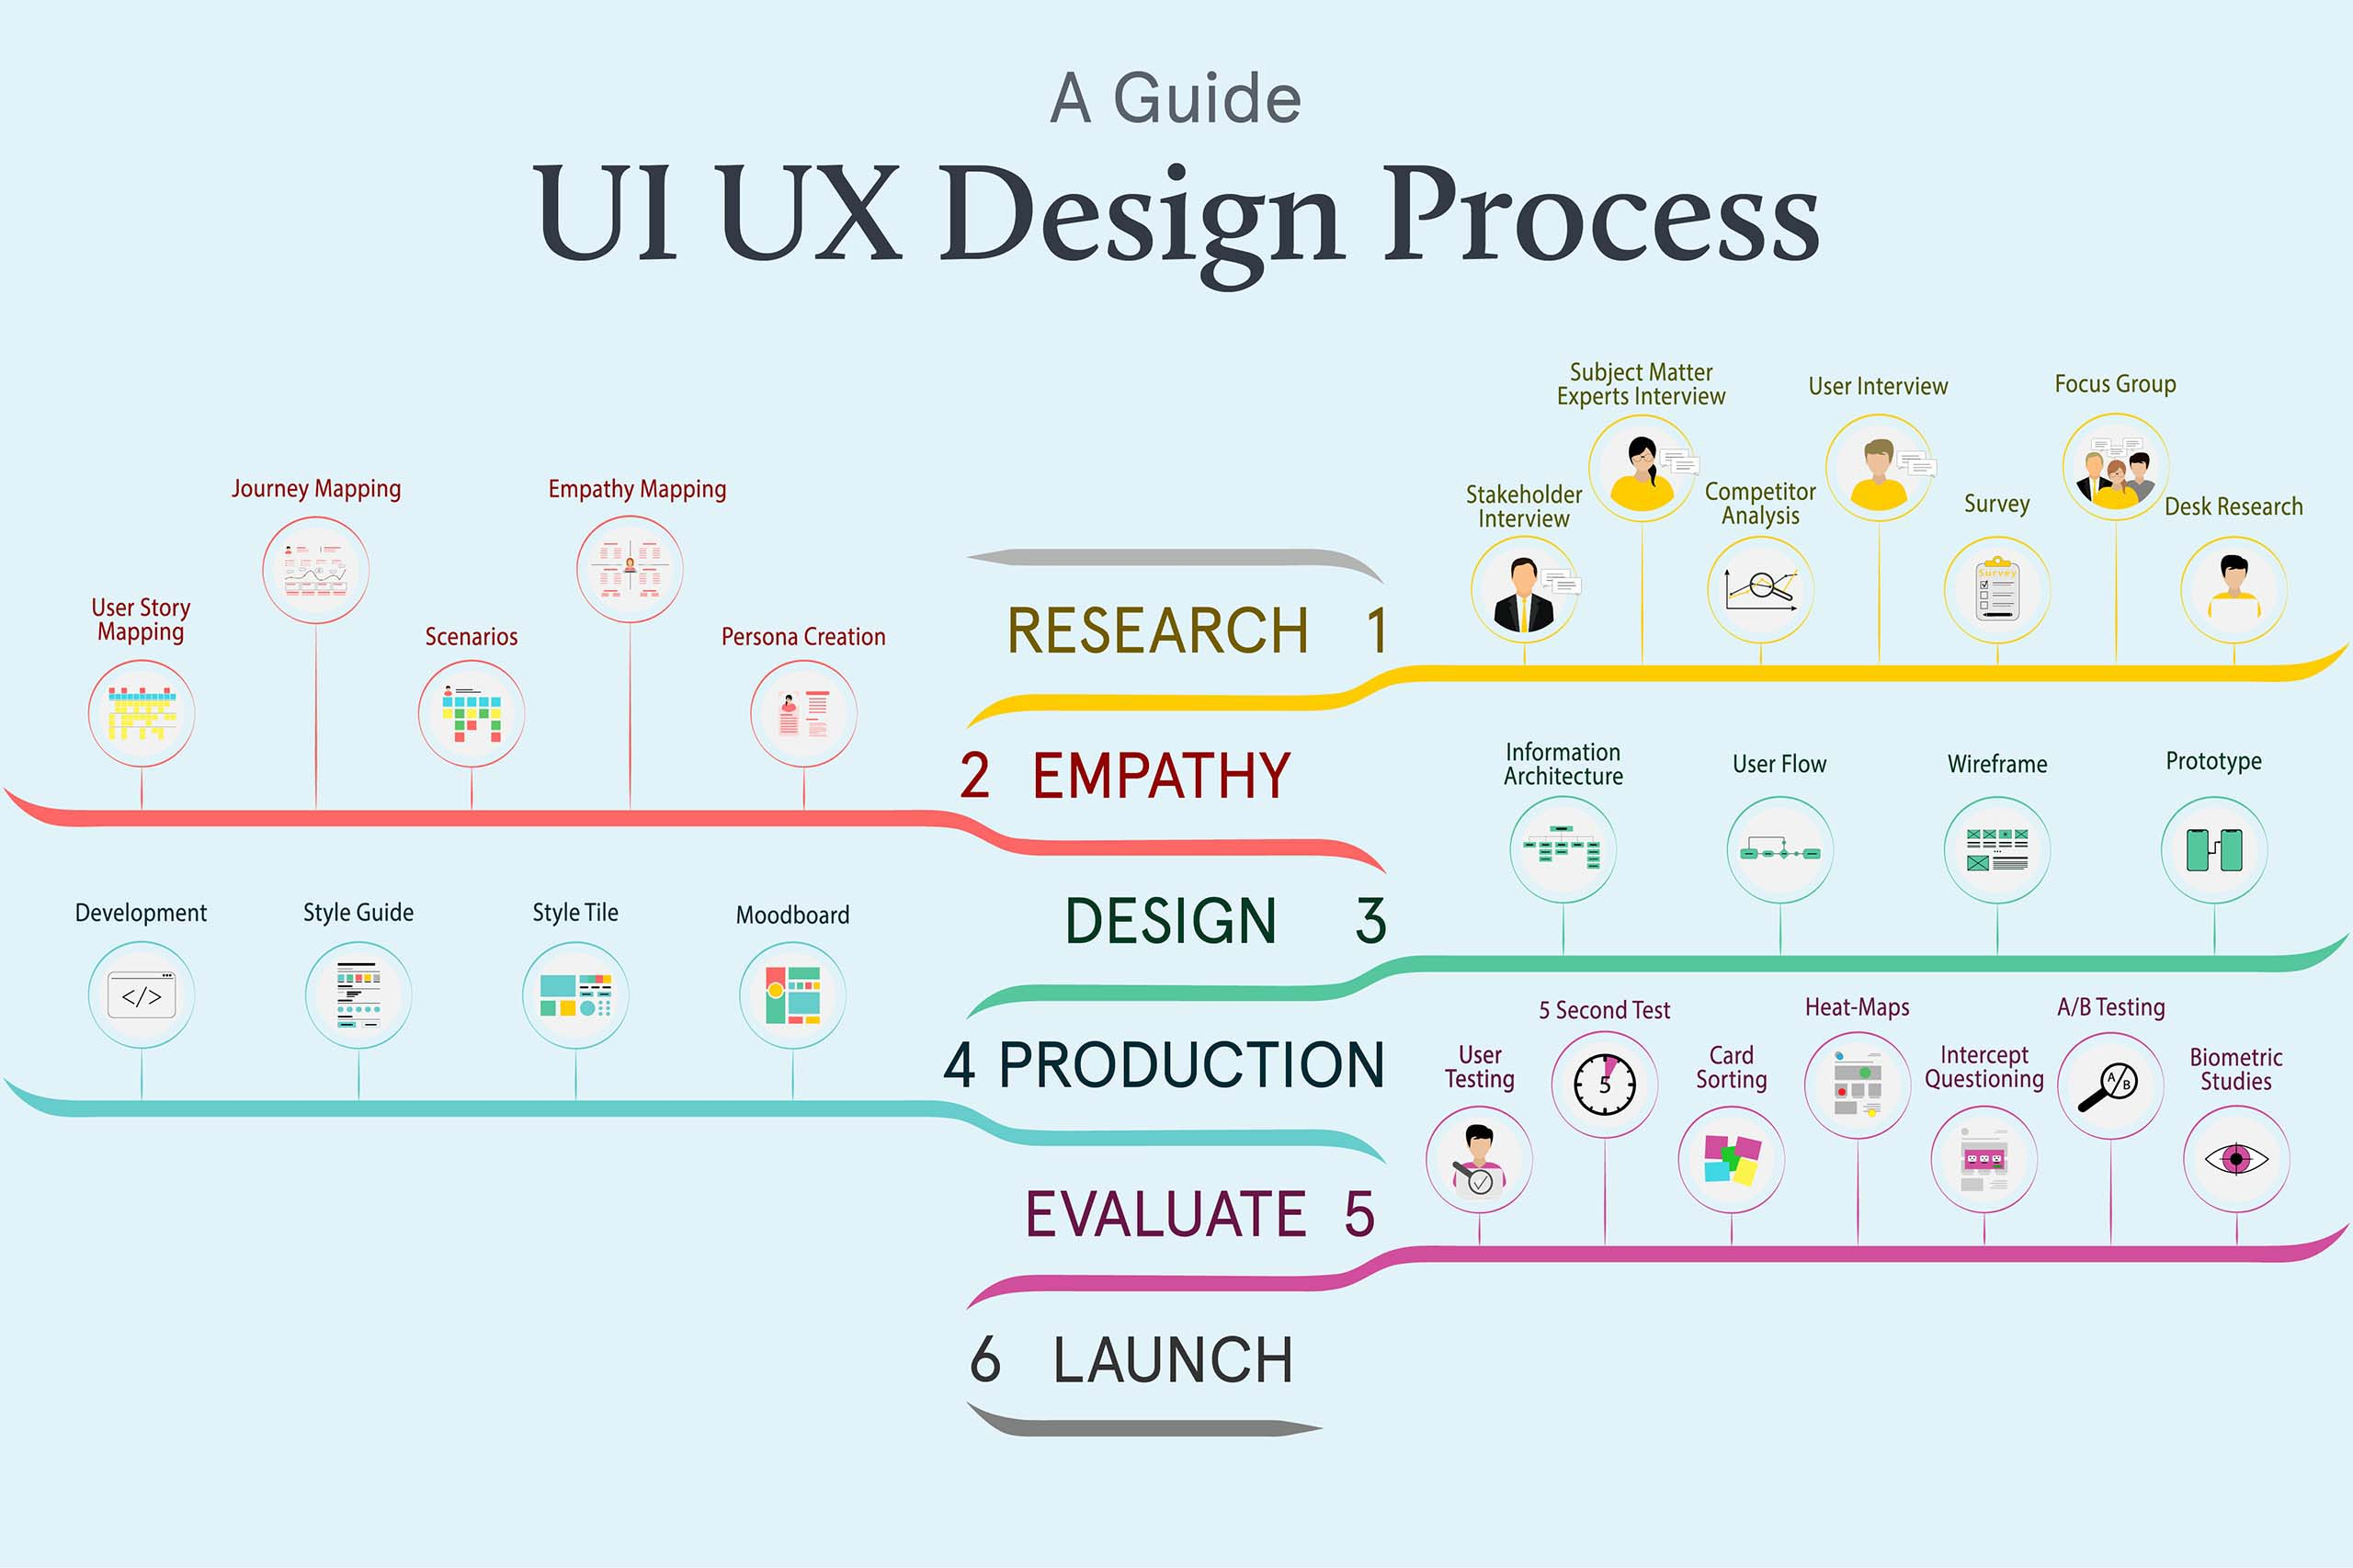 UI UX Design Process Guide for B2C B2B Designers